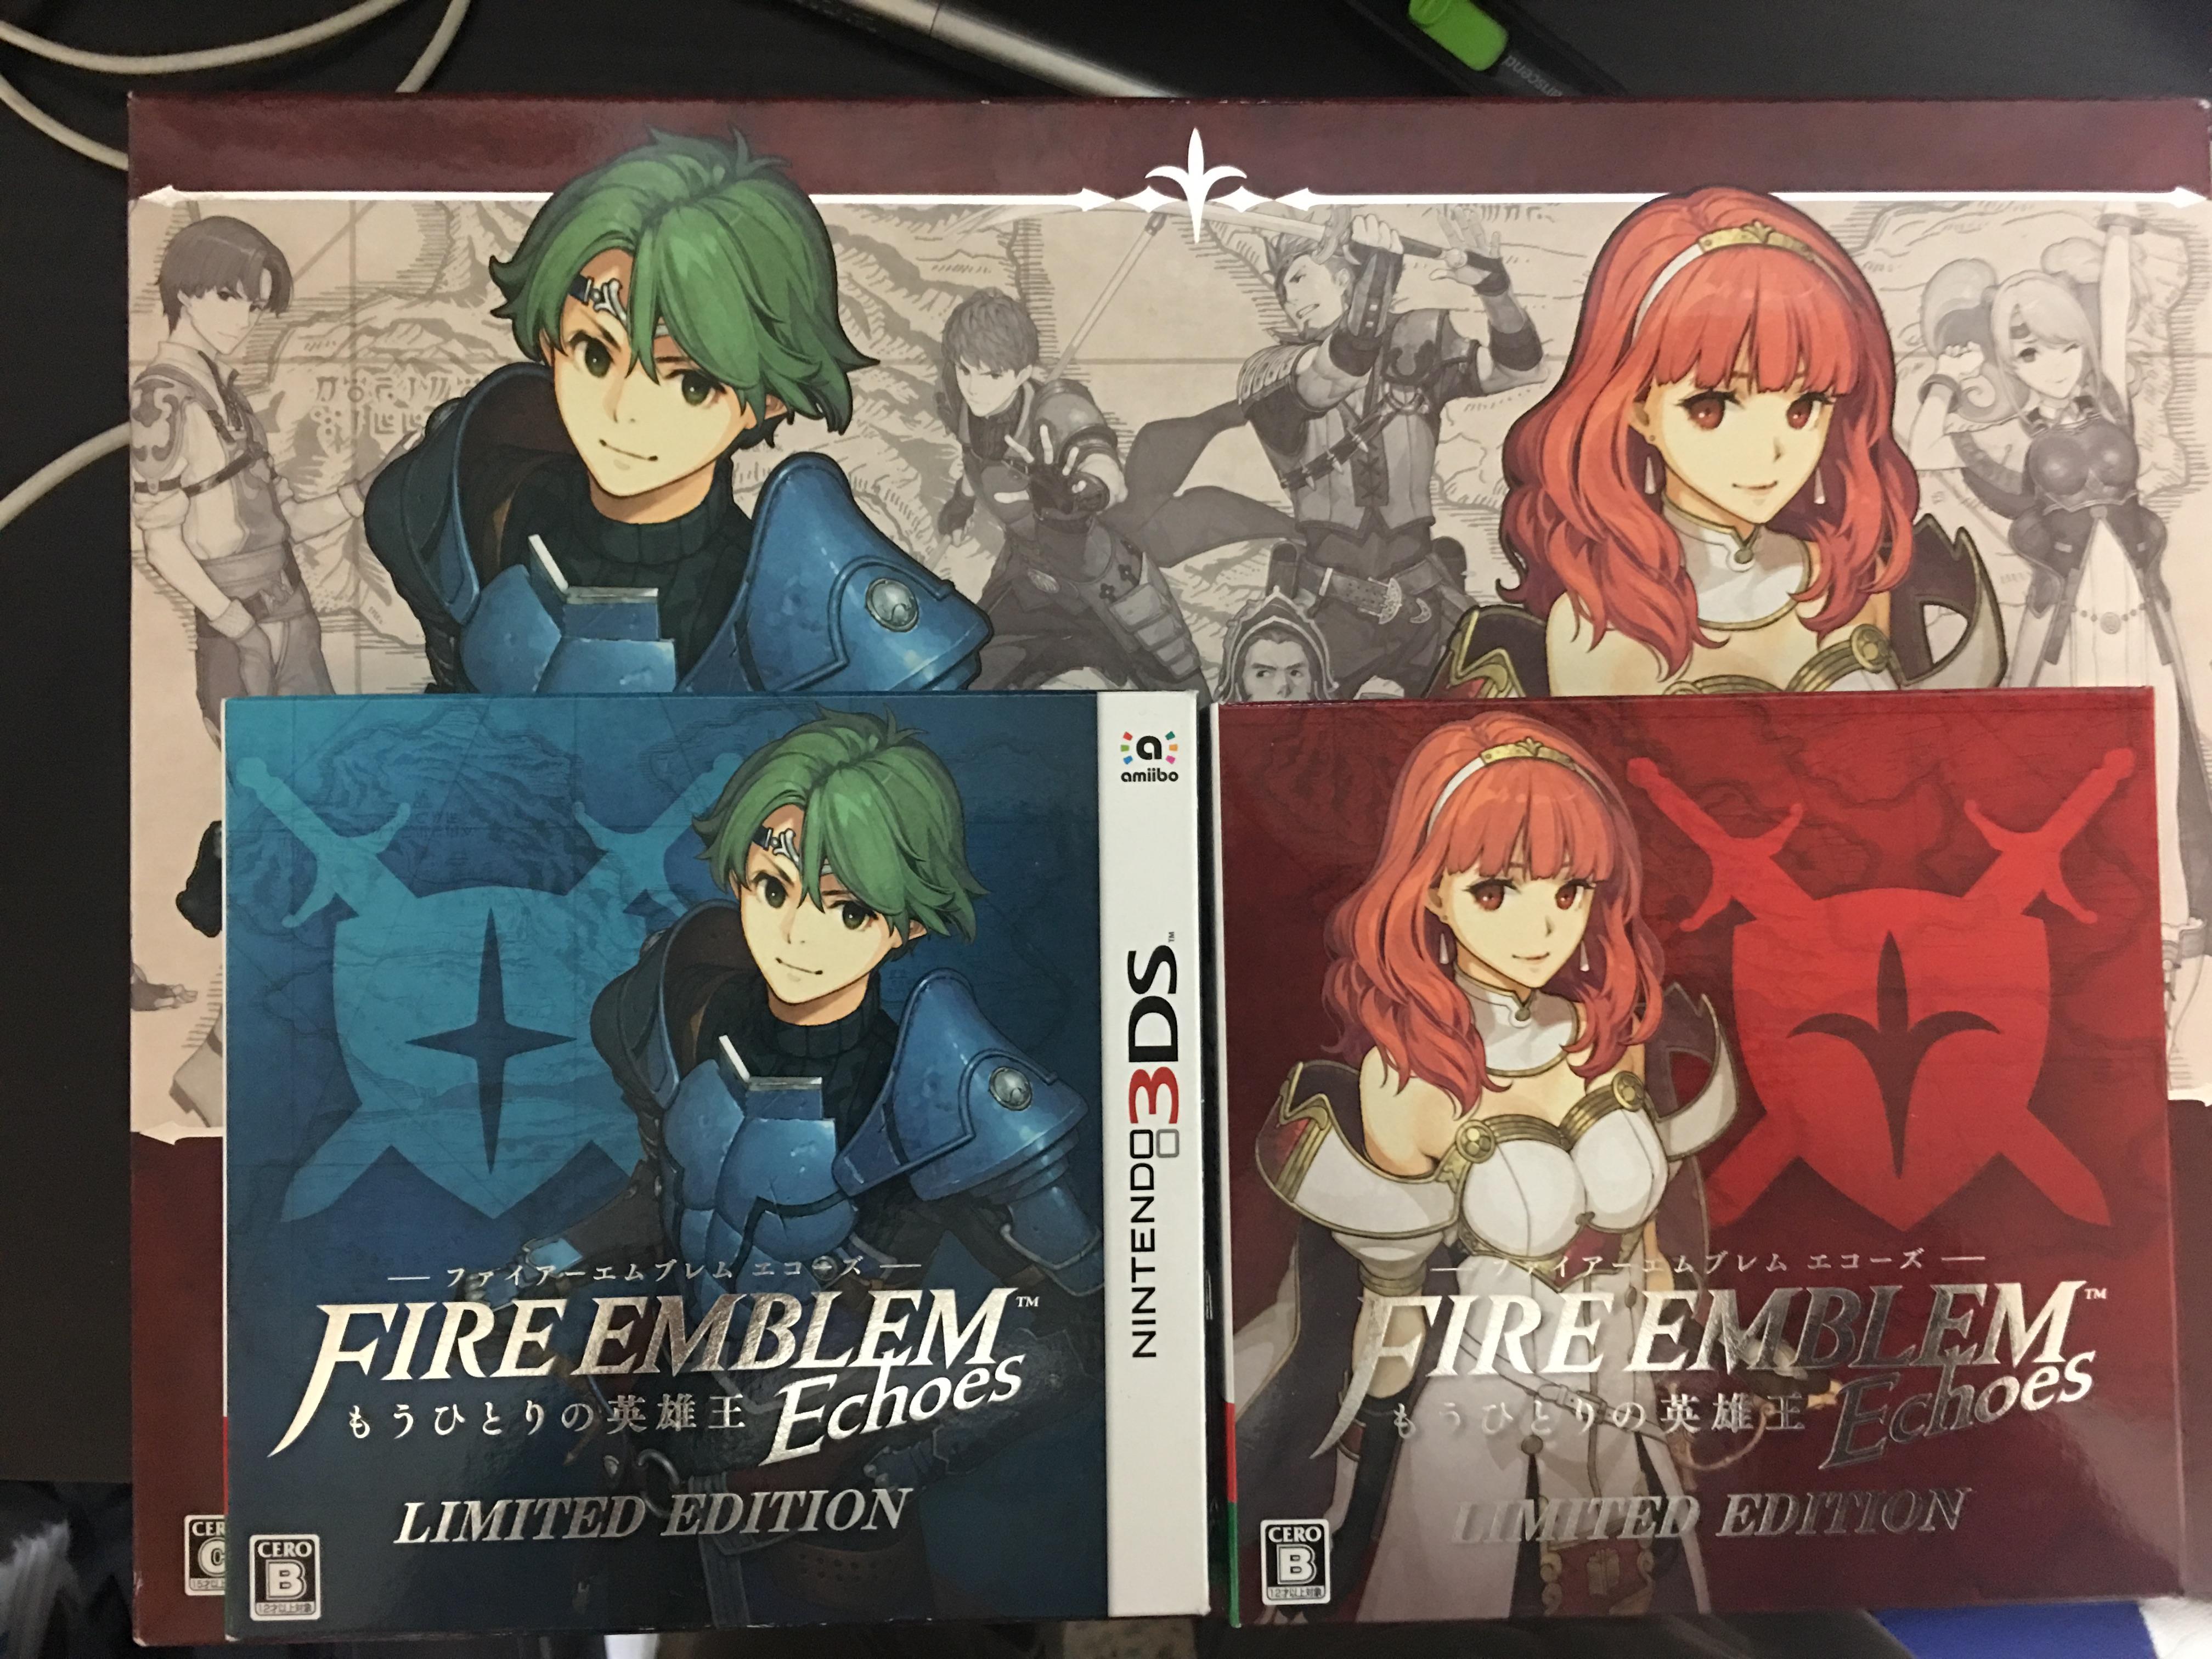 Fire Emblems Echoes